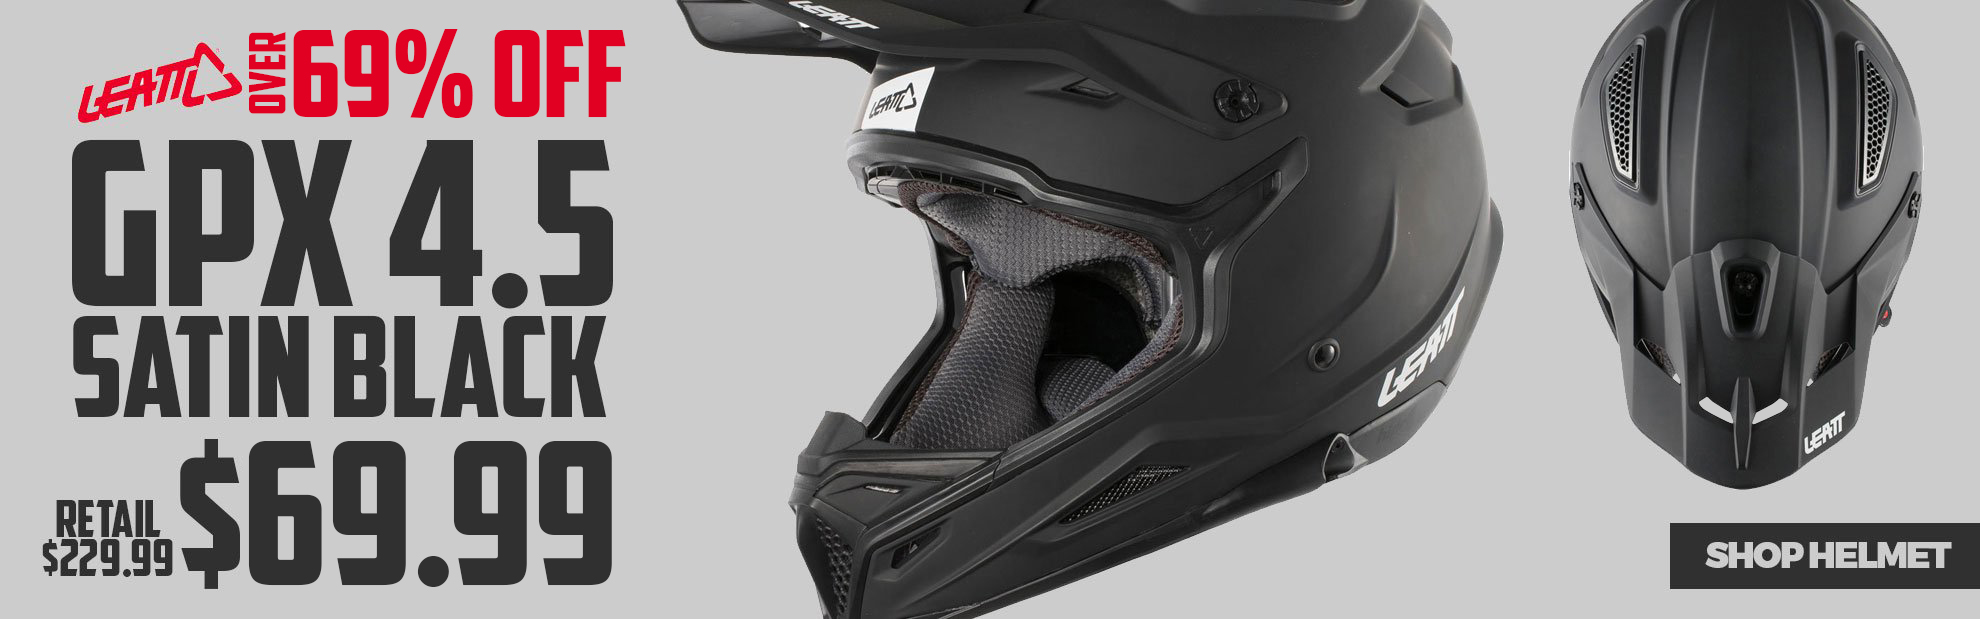 Leatt Dirt Bike Helmet Sale